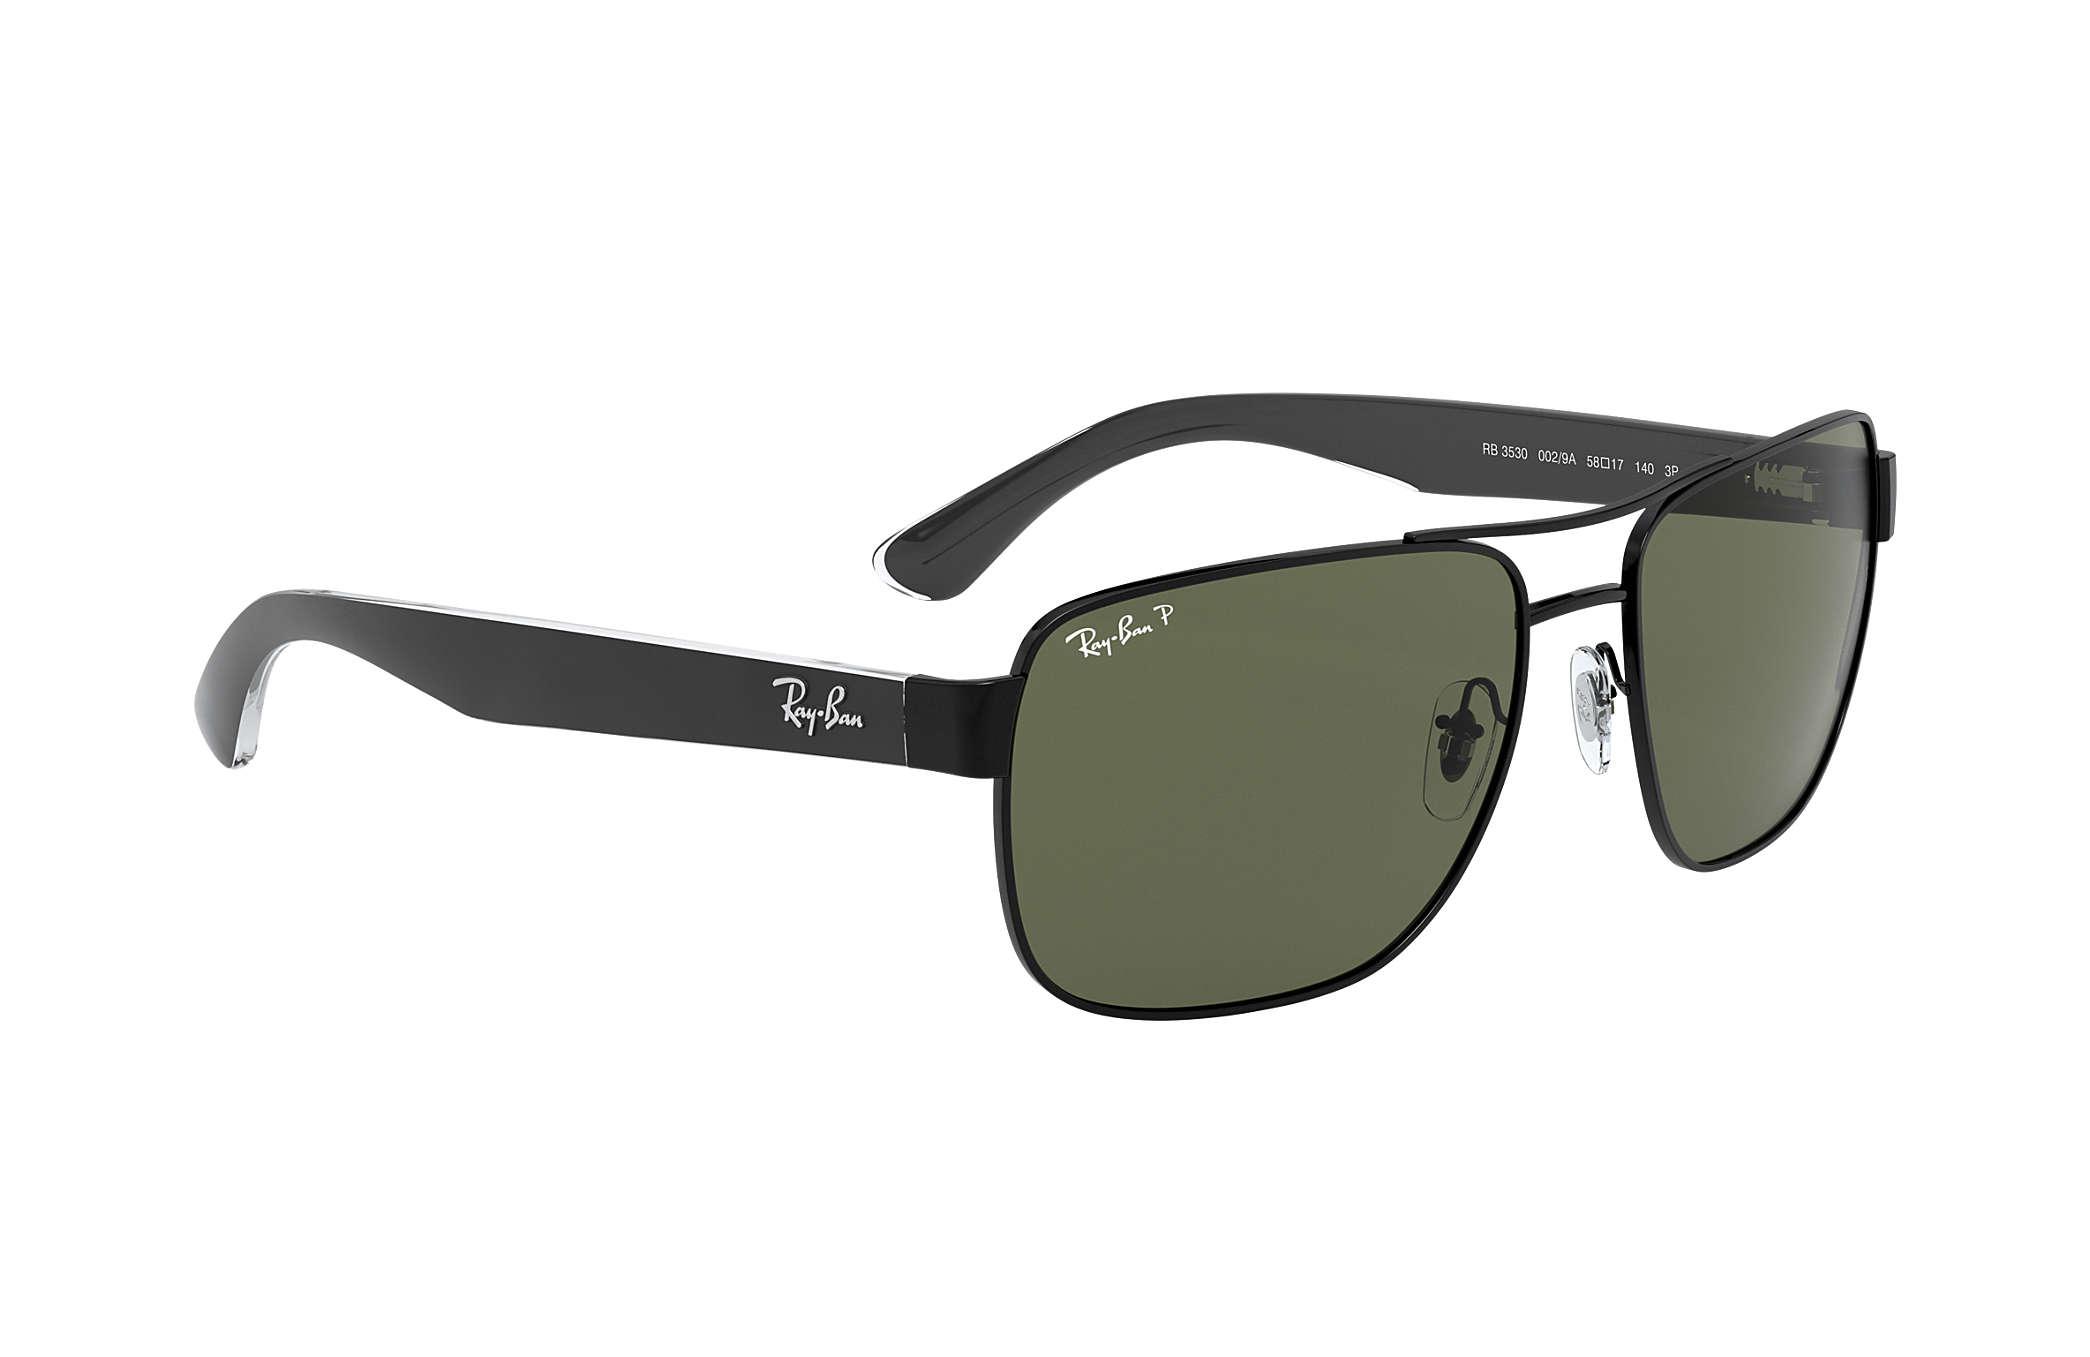 a2c7e3b3d573a Ray-Ban RB3530 Black - Metal - Green Polarized Lenses - 0RB3530002 ...